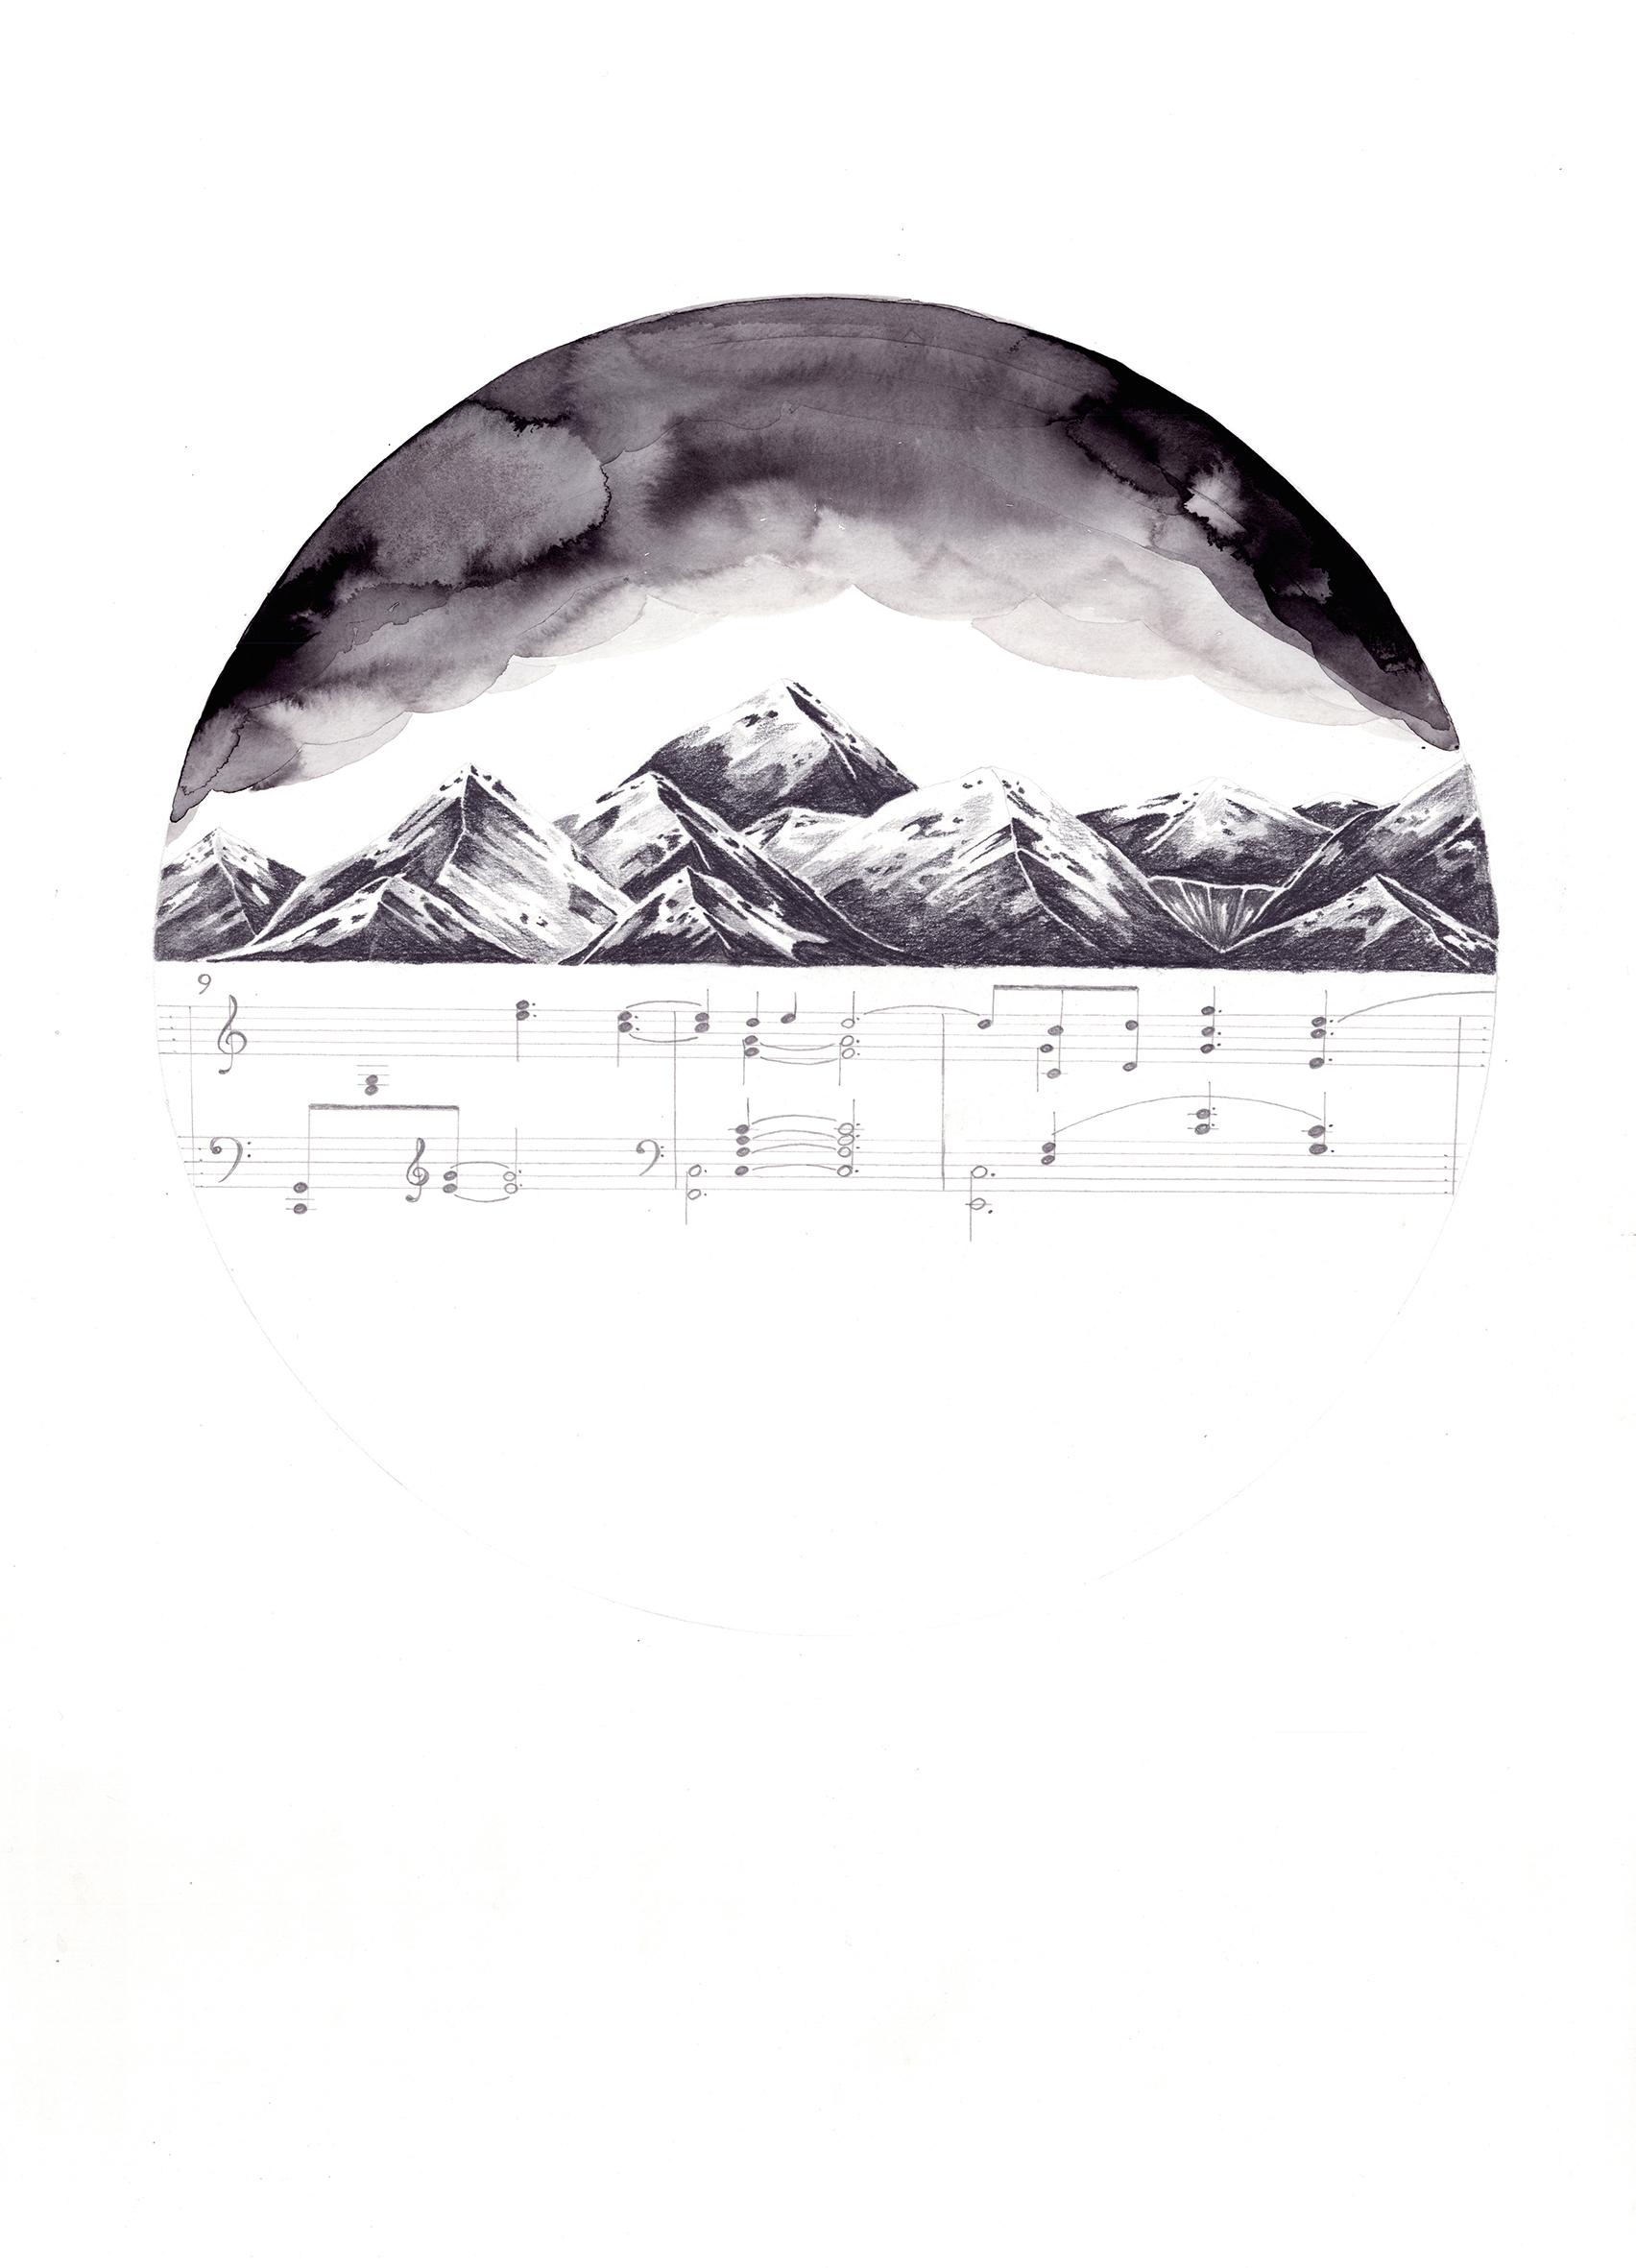 Clair de Lune 3 - Number 9 Dream